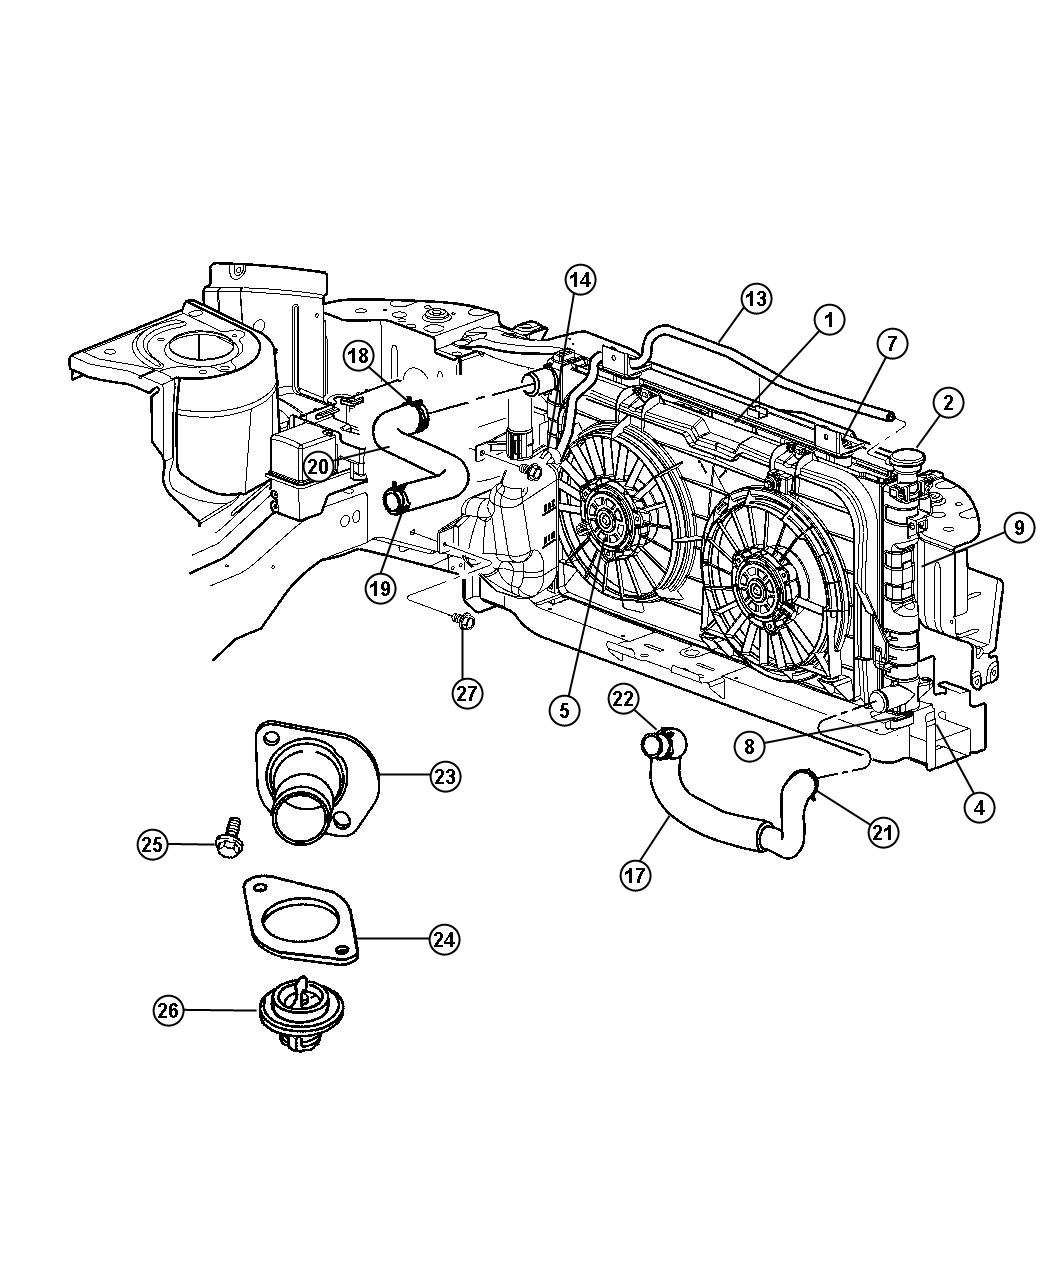 Dodge Grand Caravan Fan module. Radiator cooling. Right